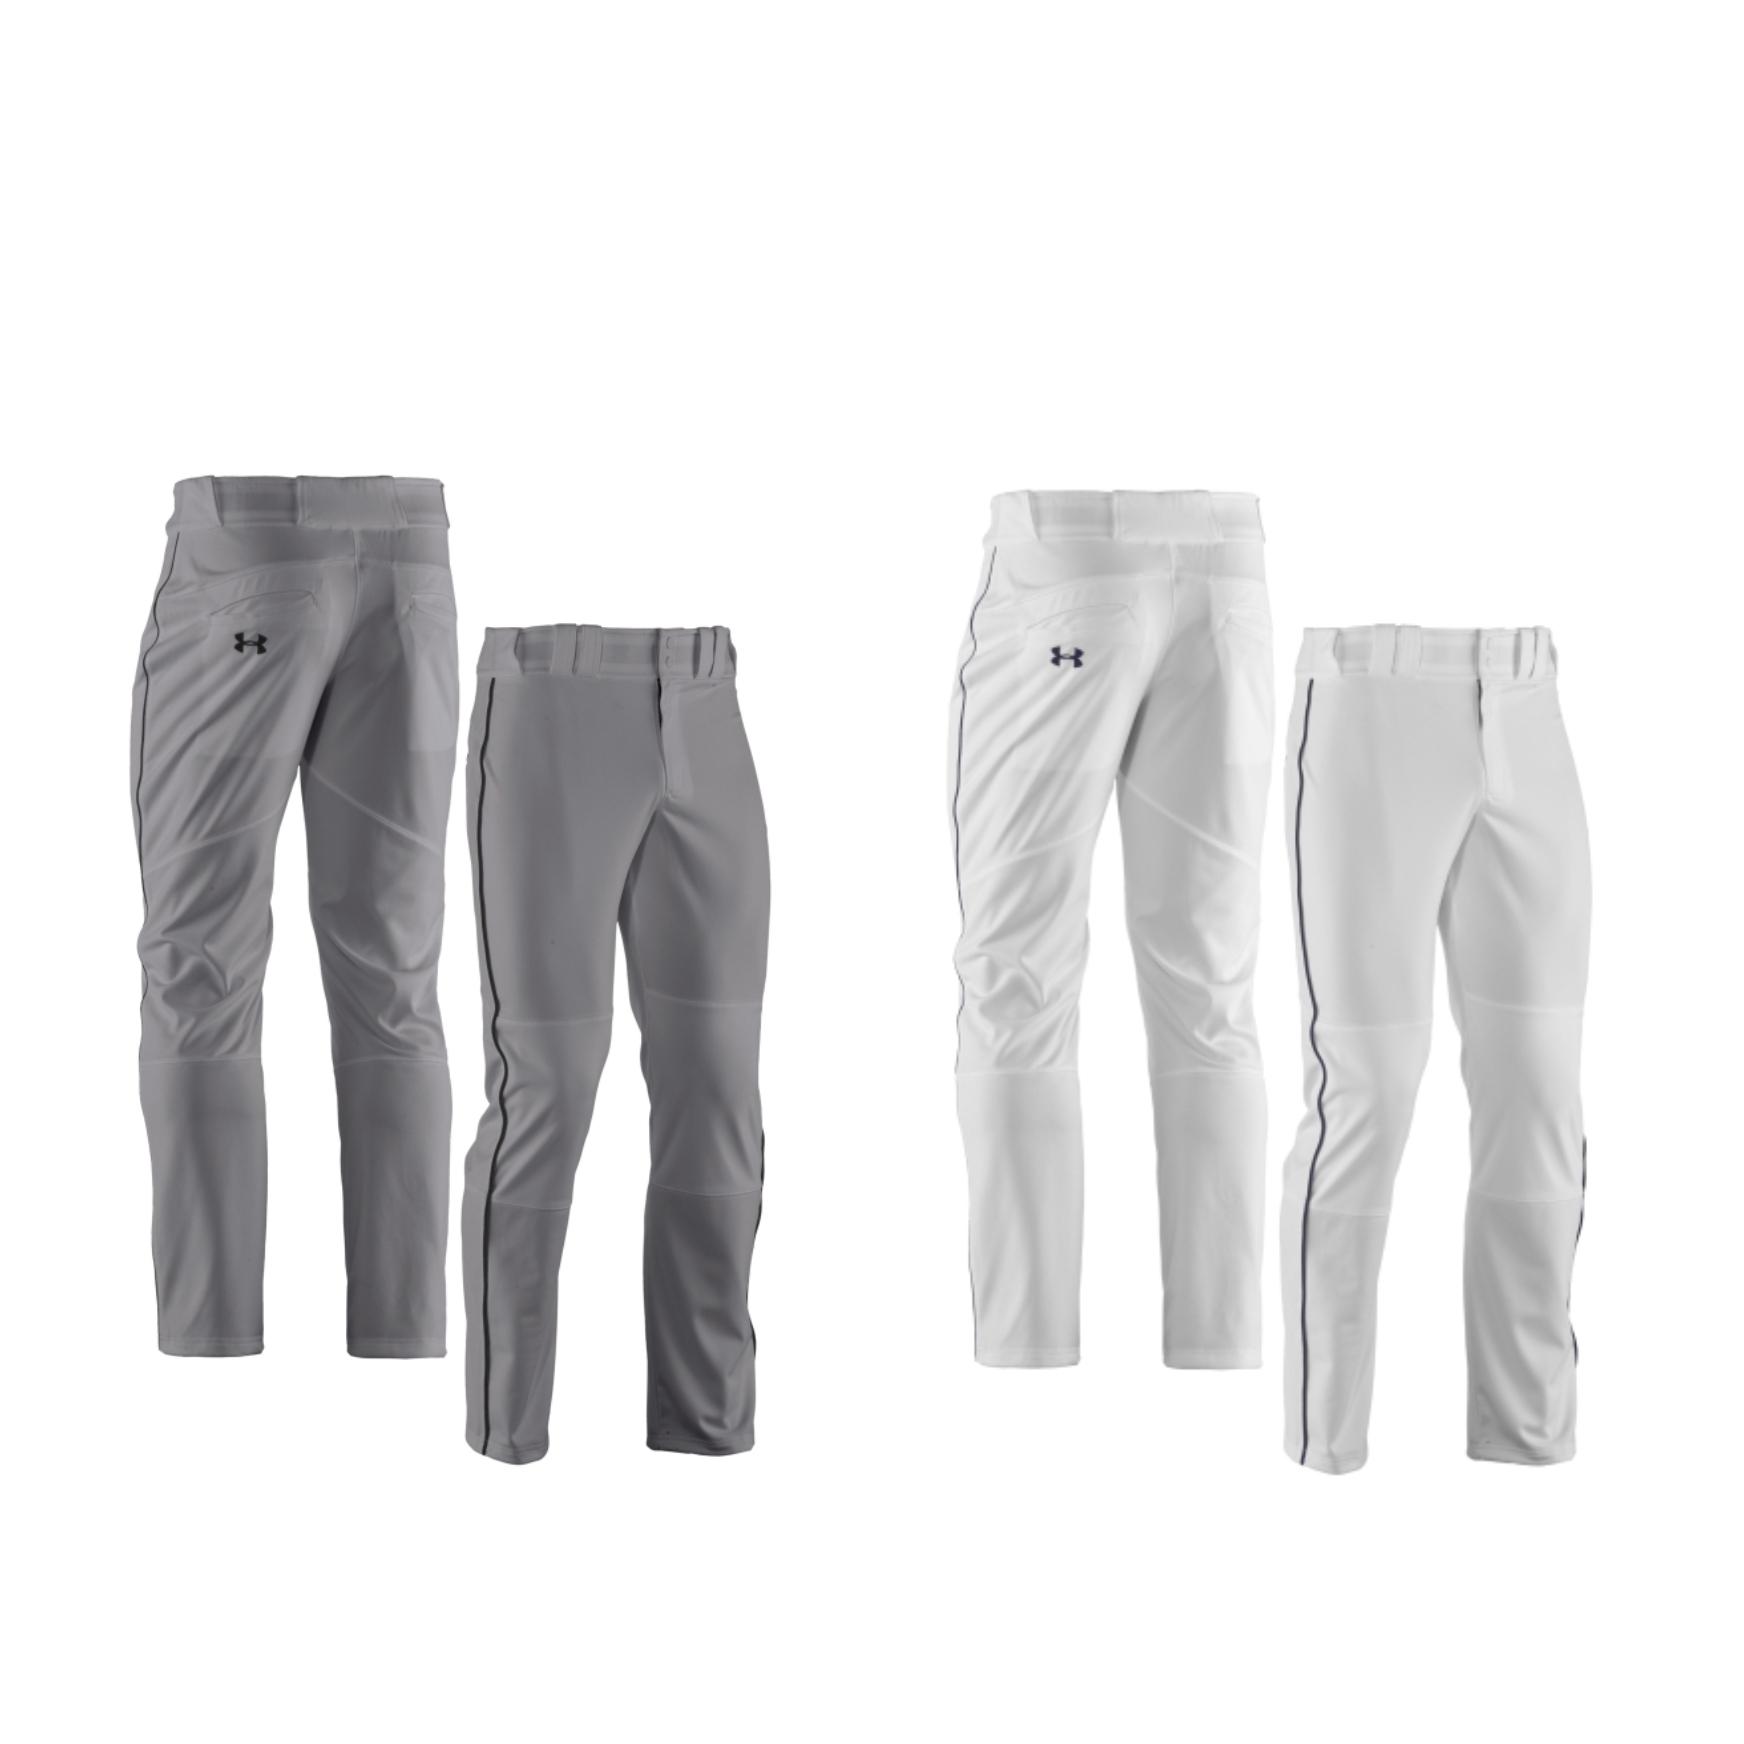 gray under armour baseball pants